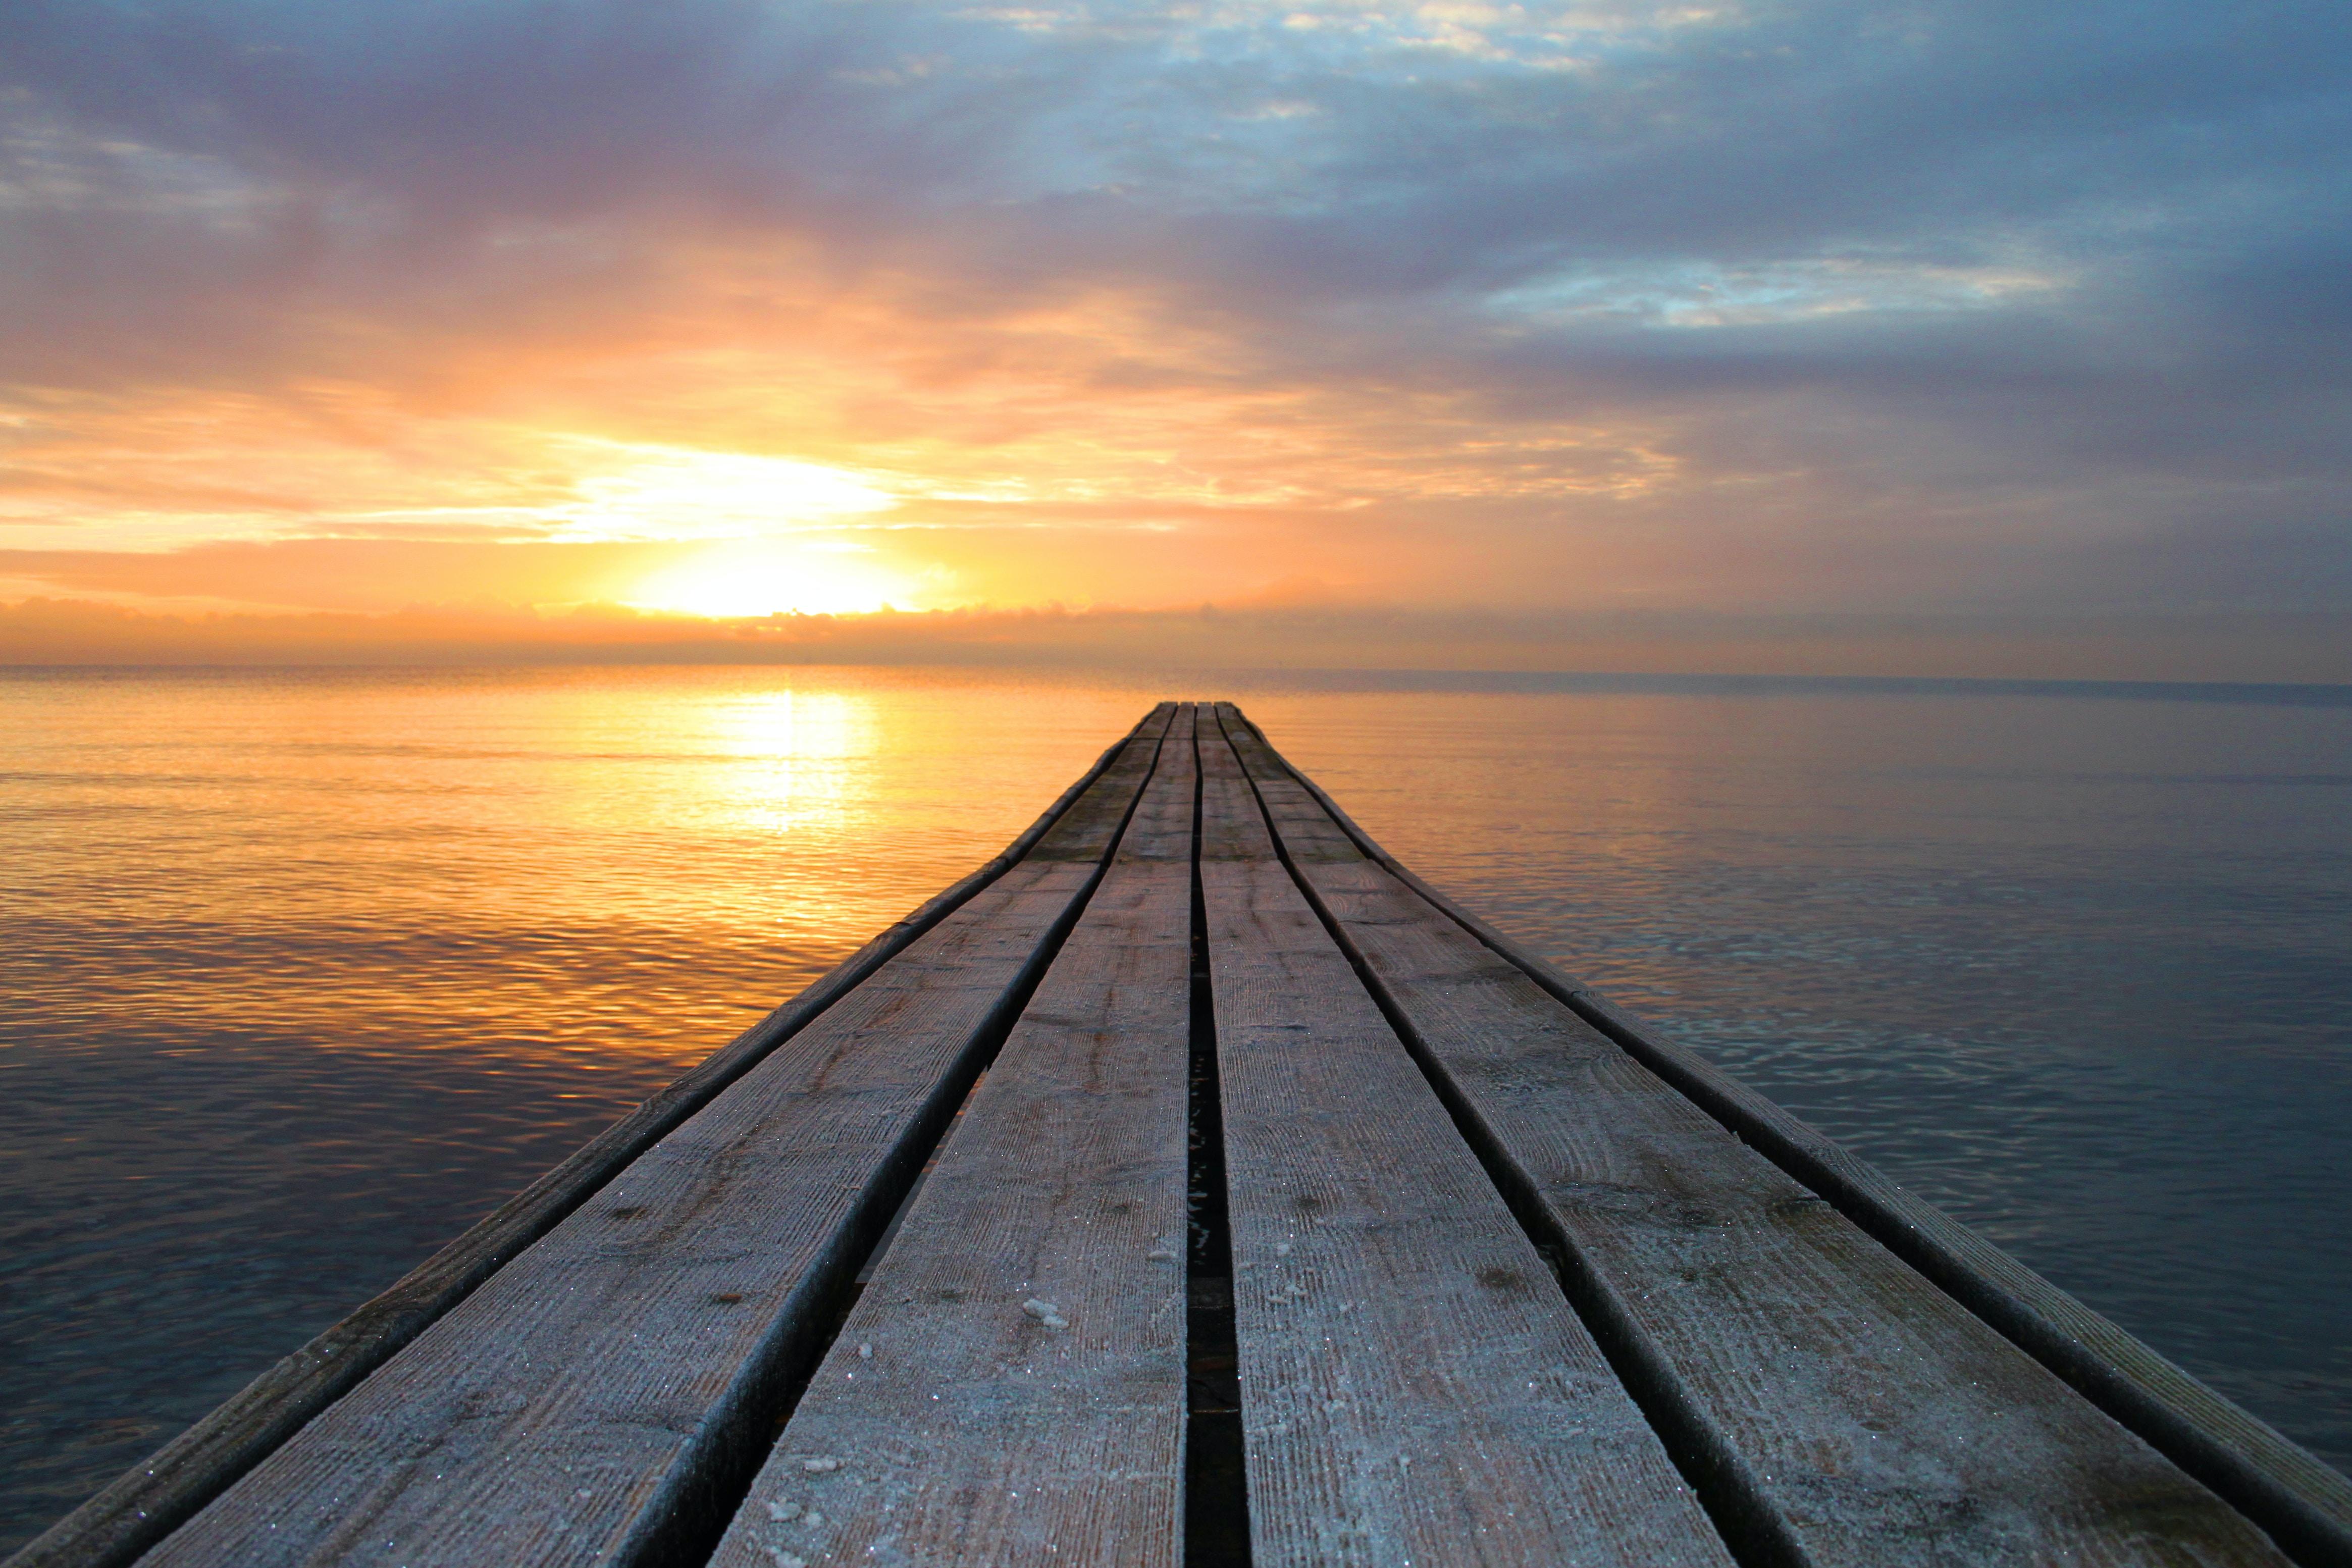 brown wooden dock near ocean during daytime